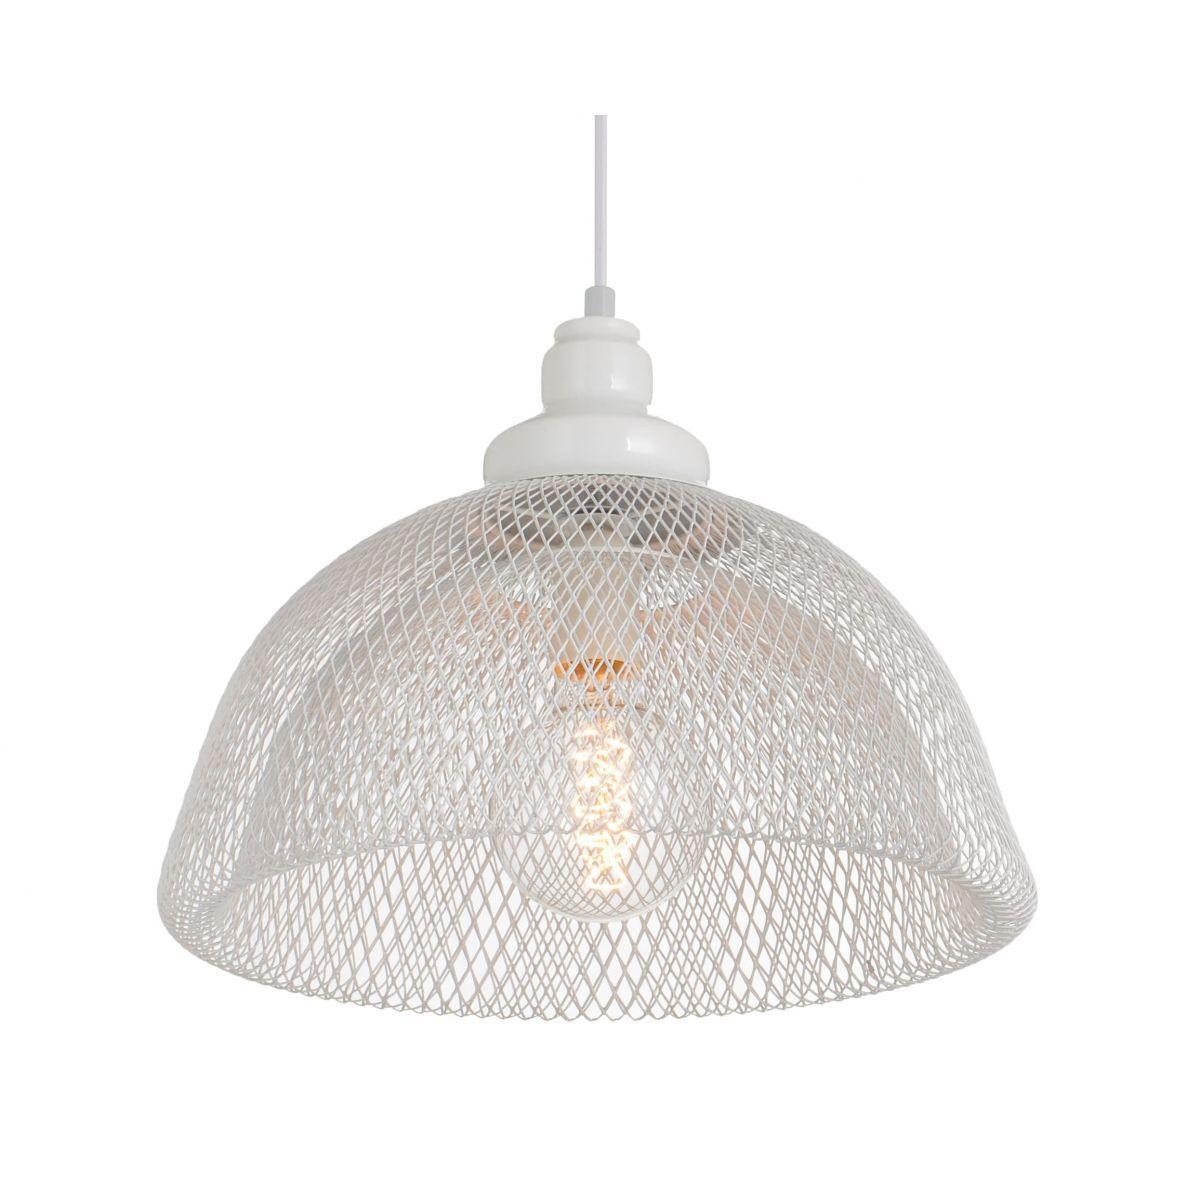 Luminária Pendente Aramado Renda Cupi Branca Ref: Lt-171A-Br - Luxtek